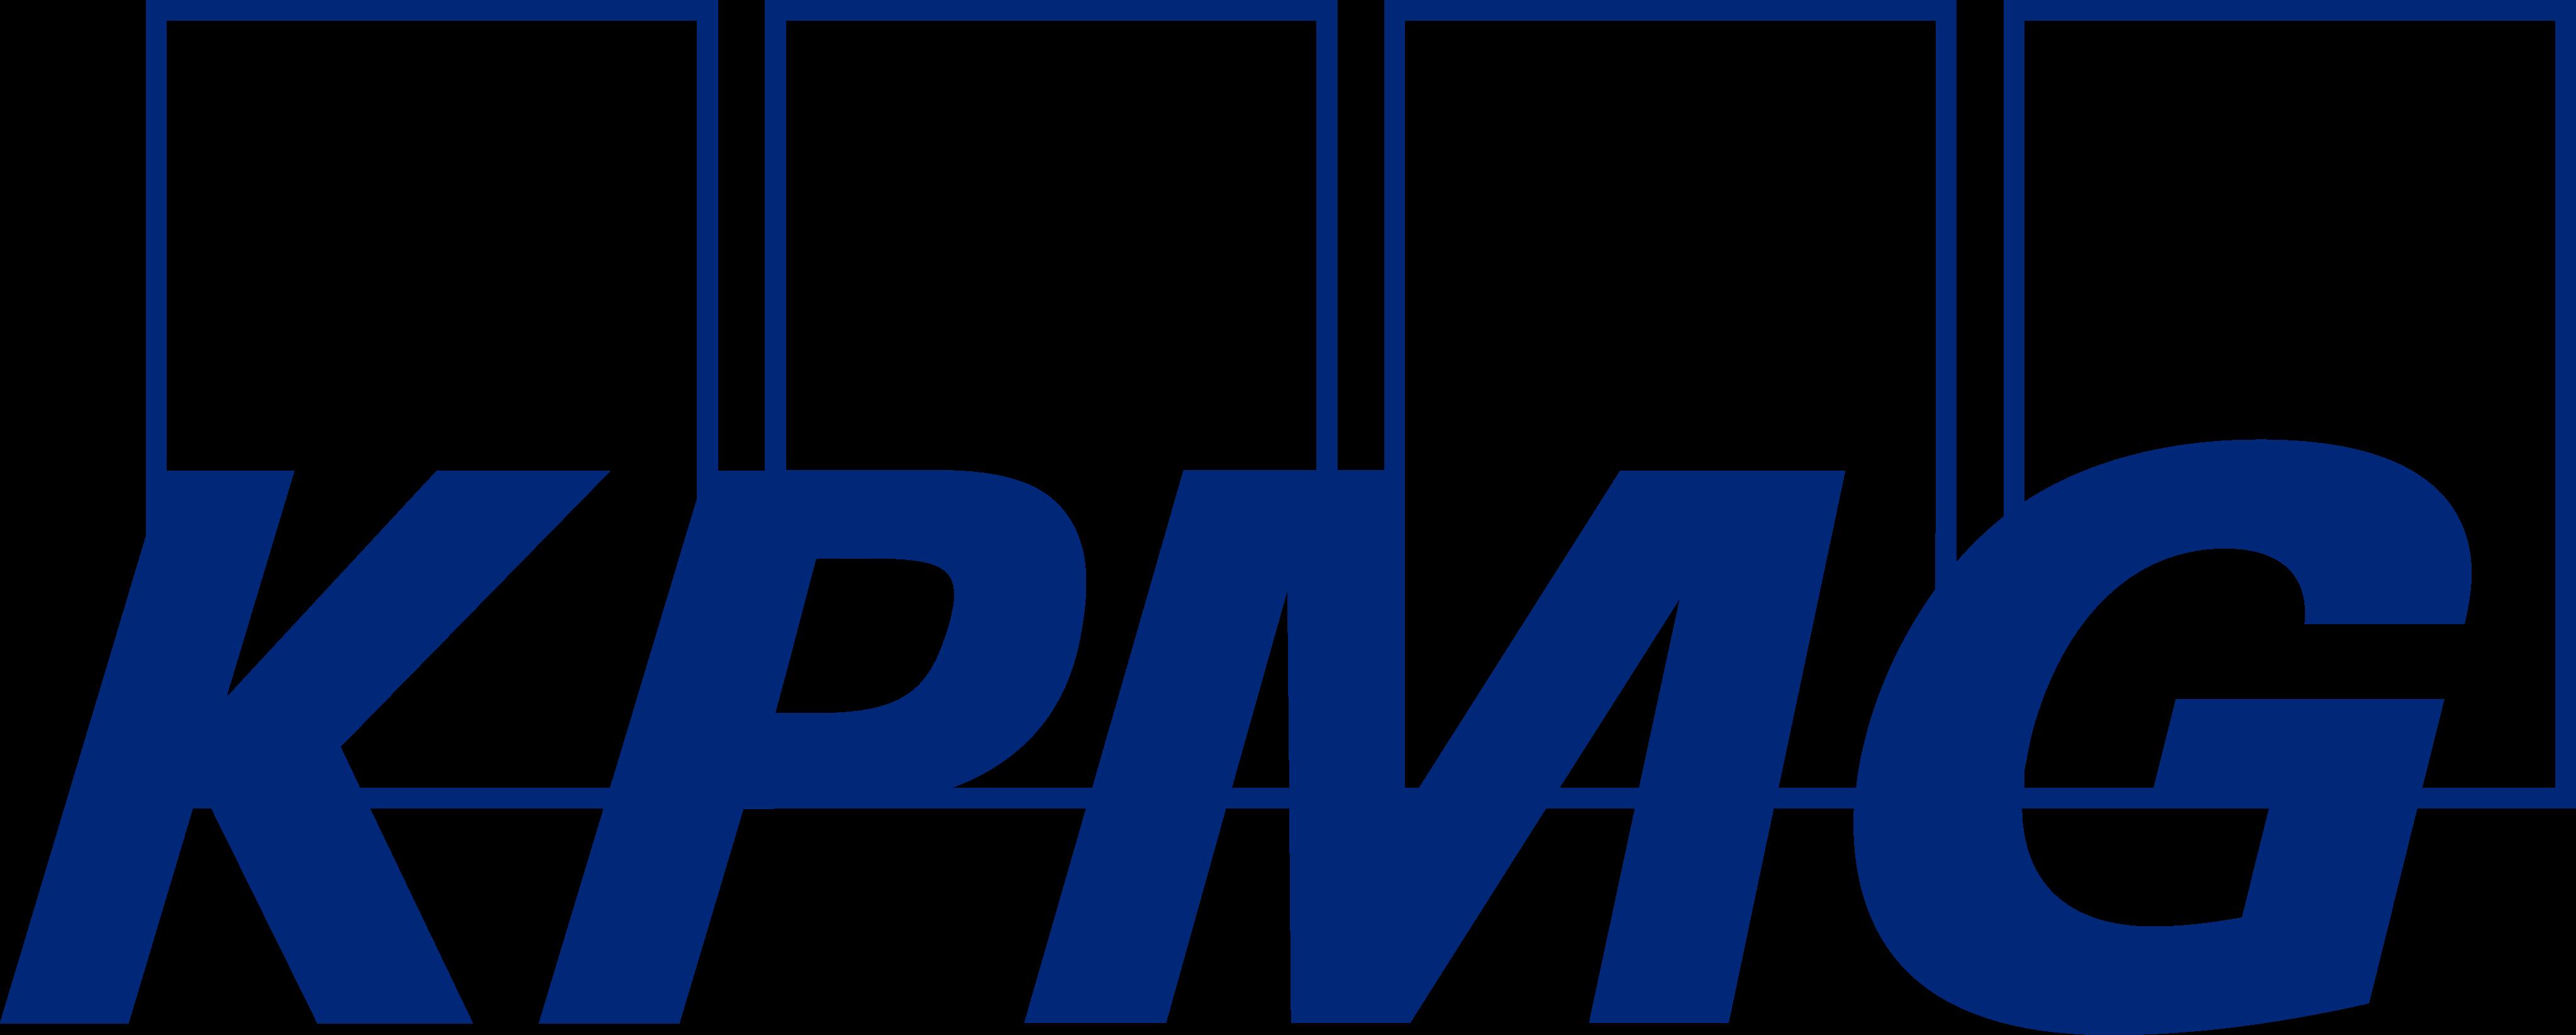 Logotipo KPMG